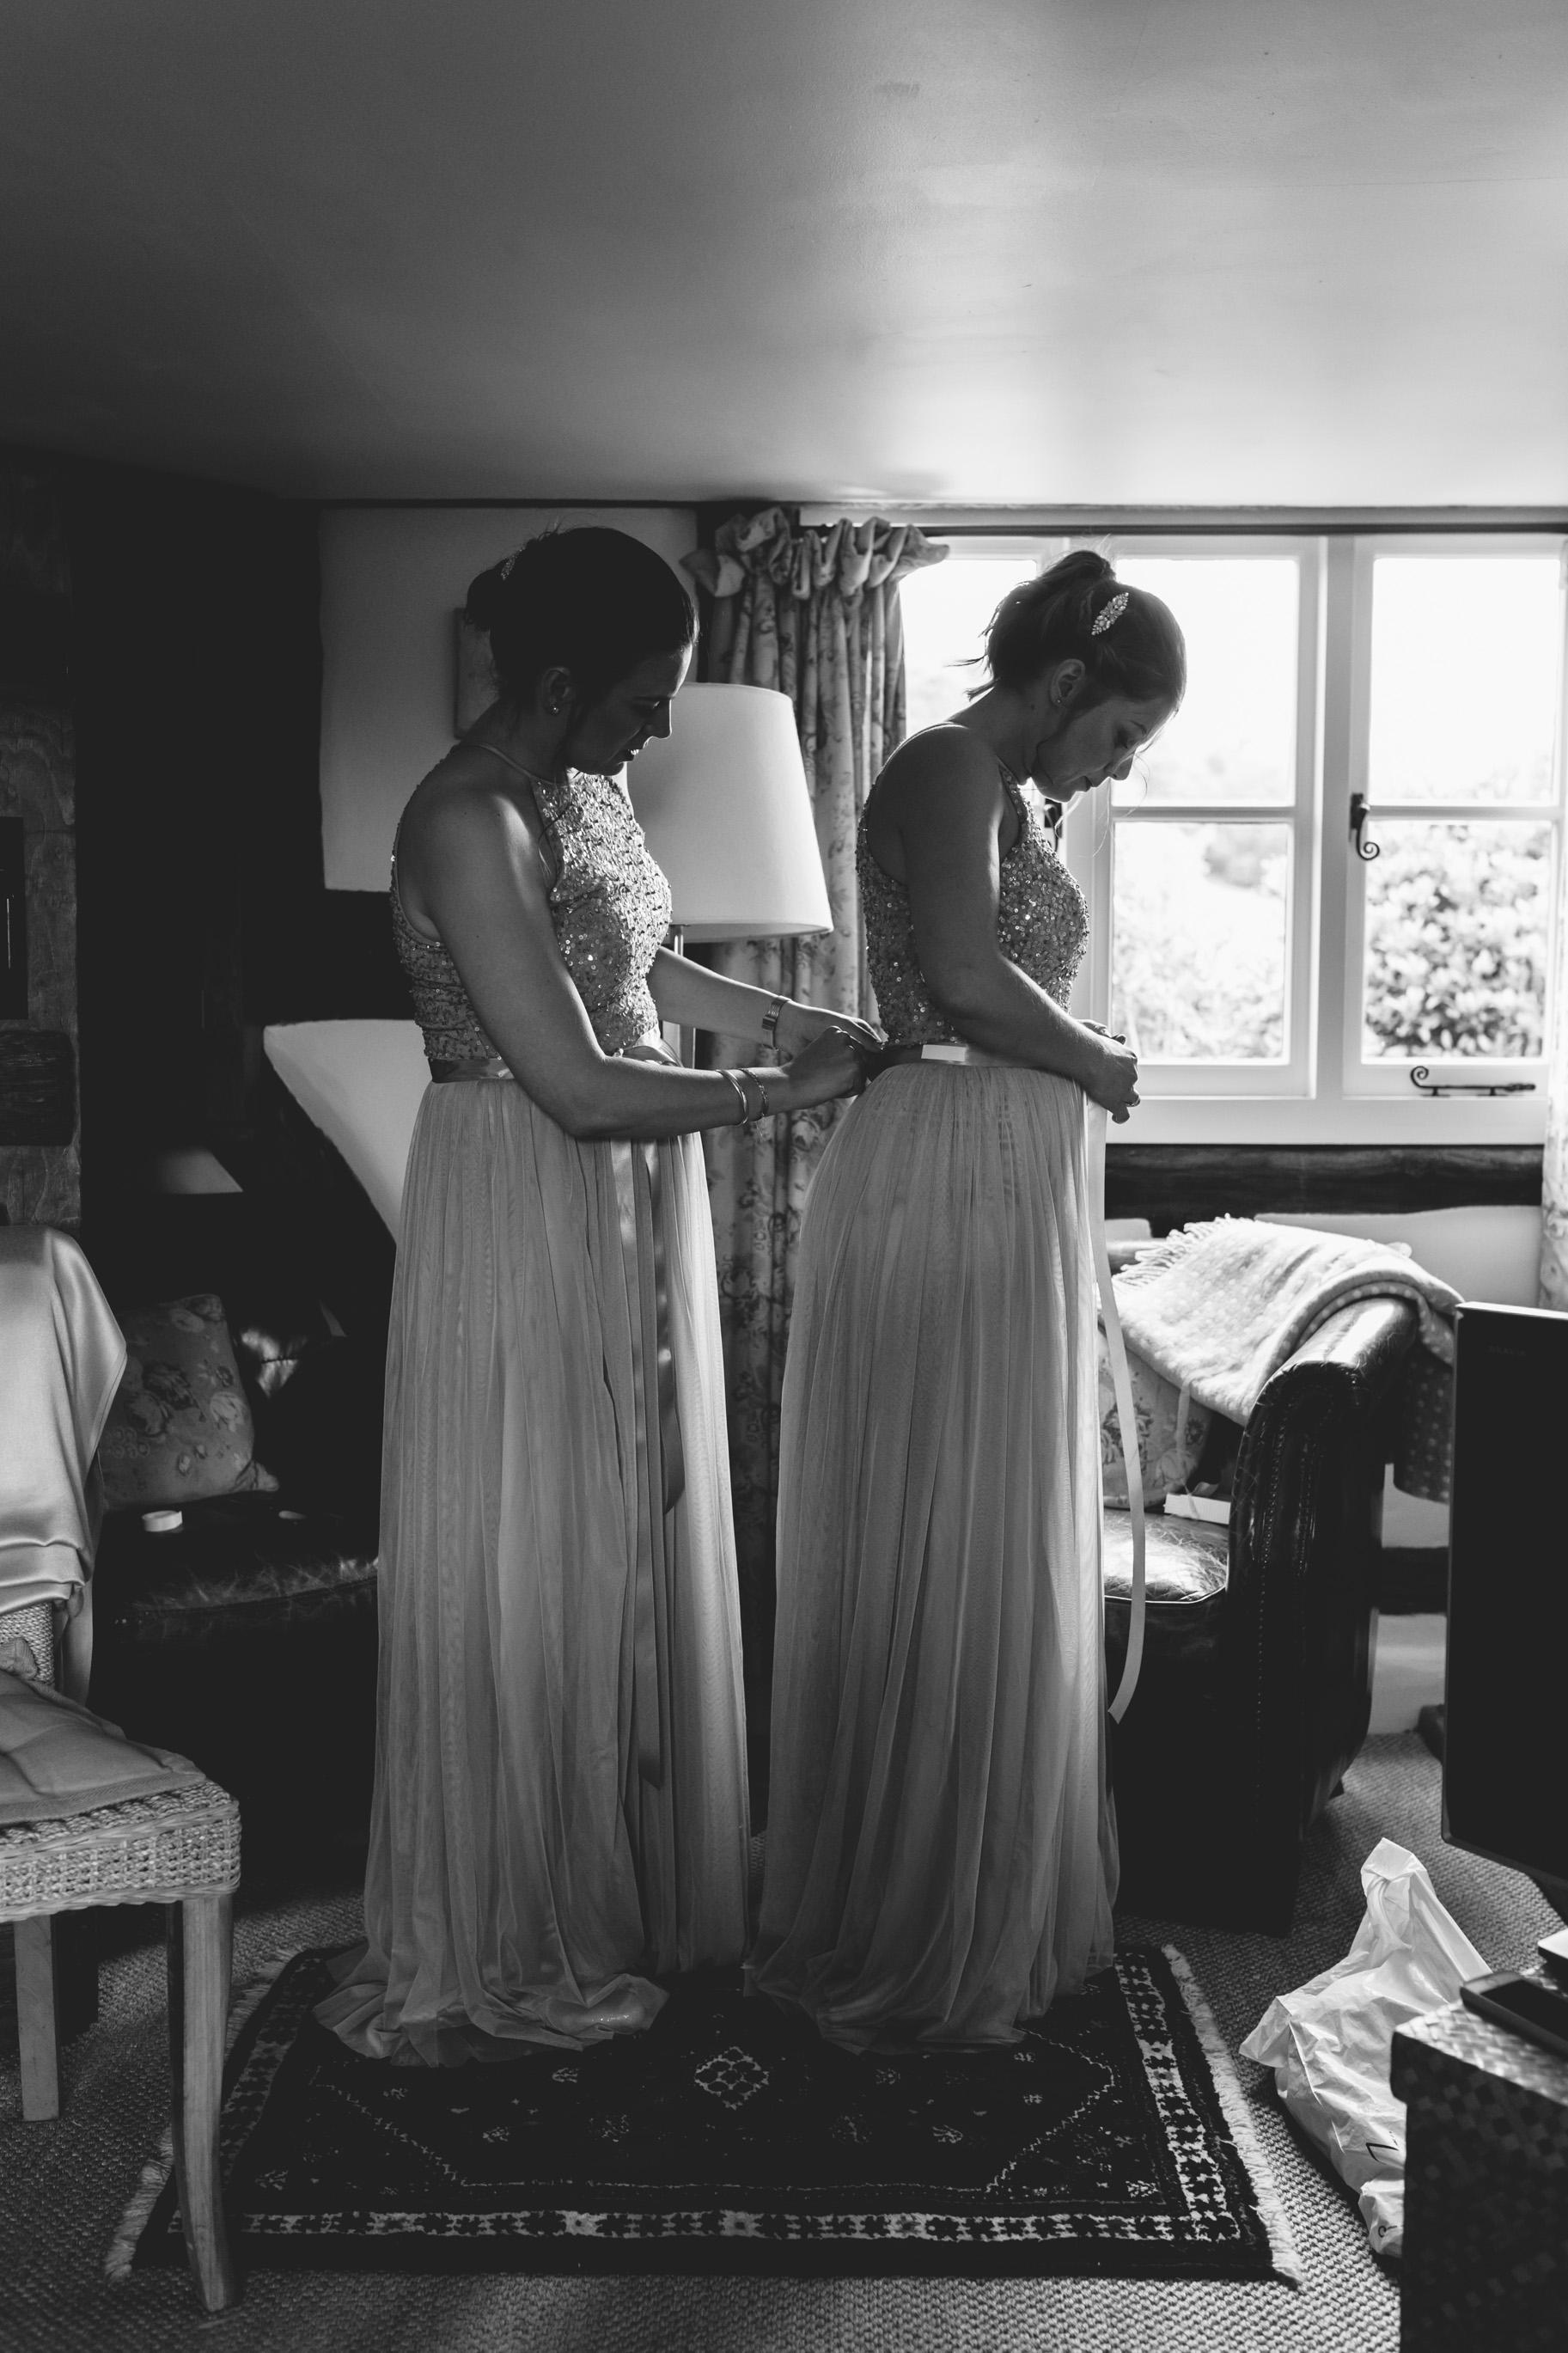 bridesmaids Birmingham photographer wedding country artistic wedding photography94.jpg